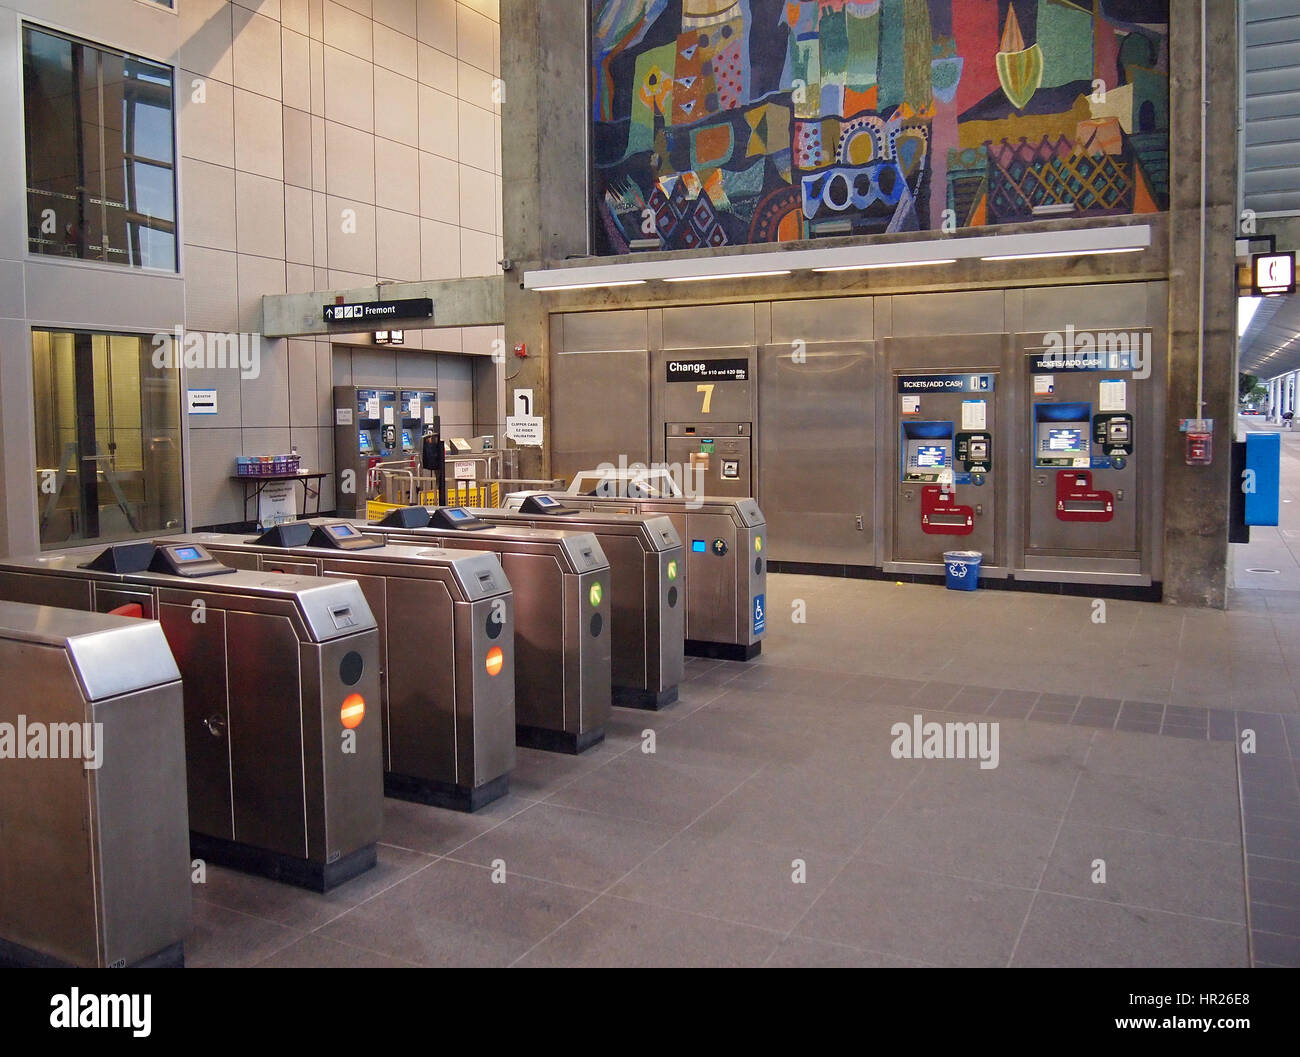 Bay Area Rapid Transit, BART, Union City , station entrance, California, USA - Stock Image